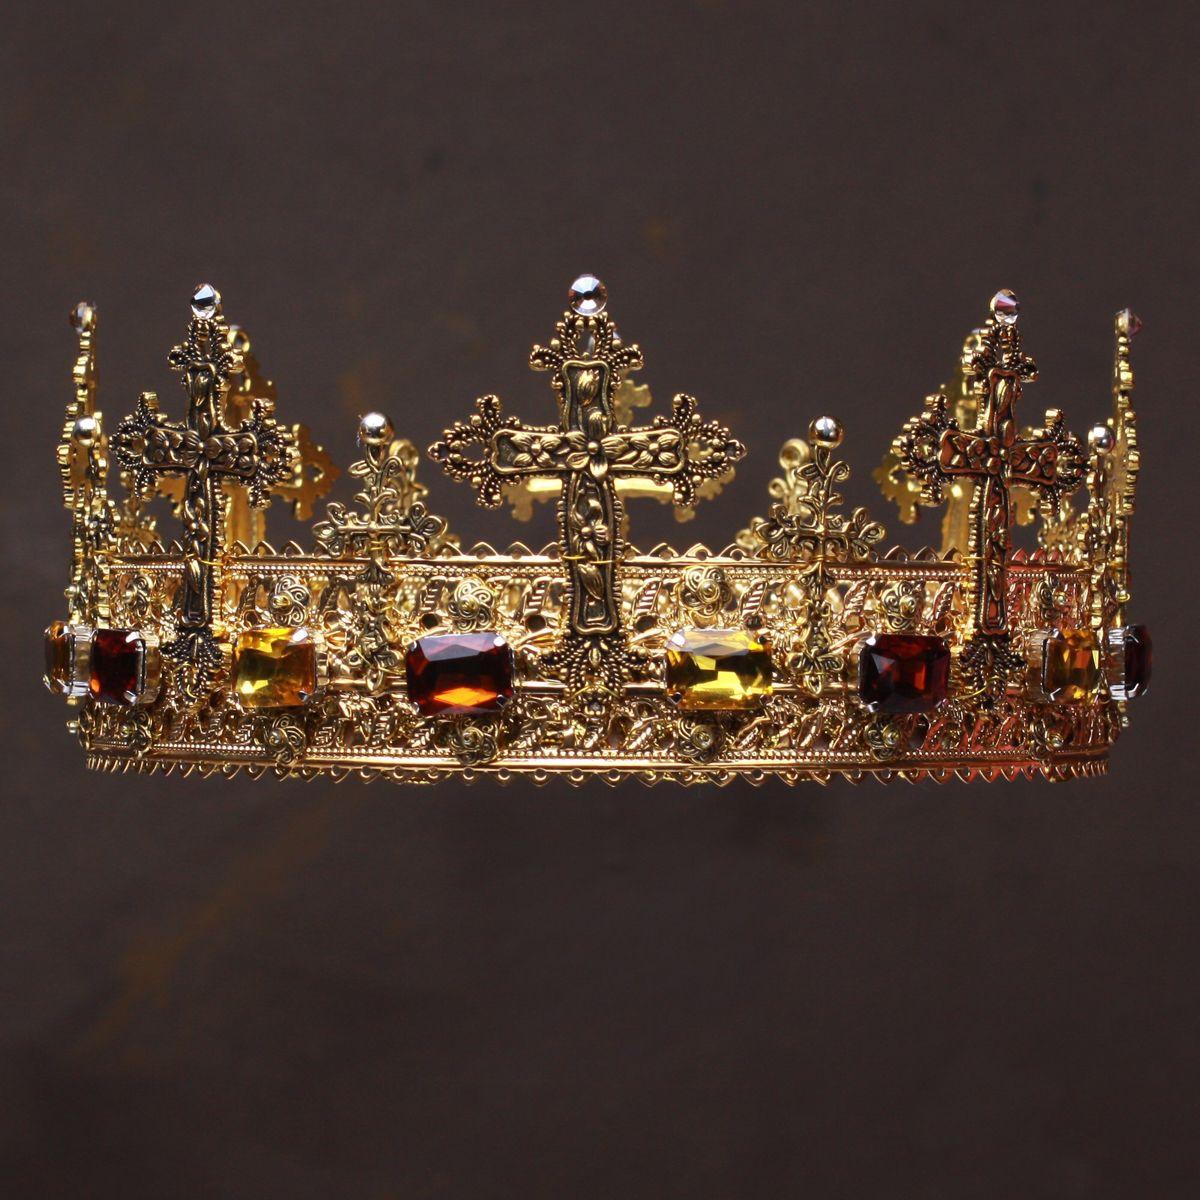 Diálogo Sin valor Garganta  Pin by Luhan FP on Lion King Dystopia   Medieval crown, Gold king crown,  Kings crown